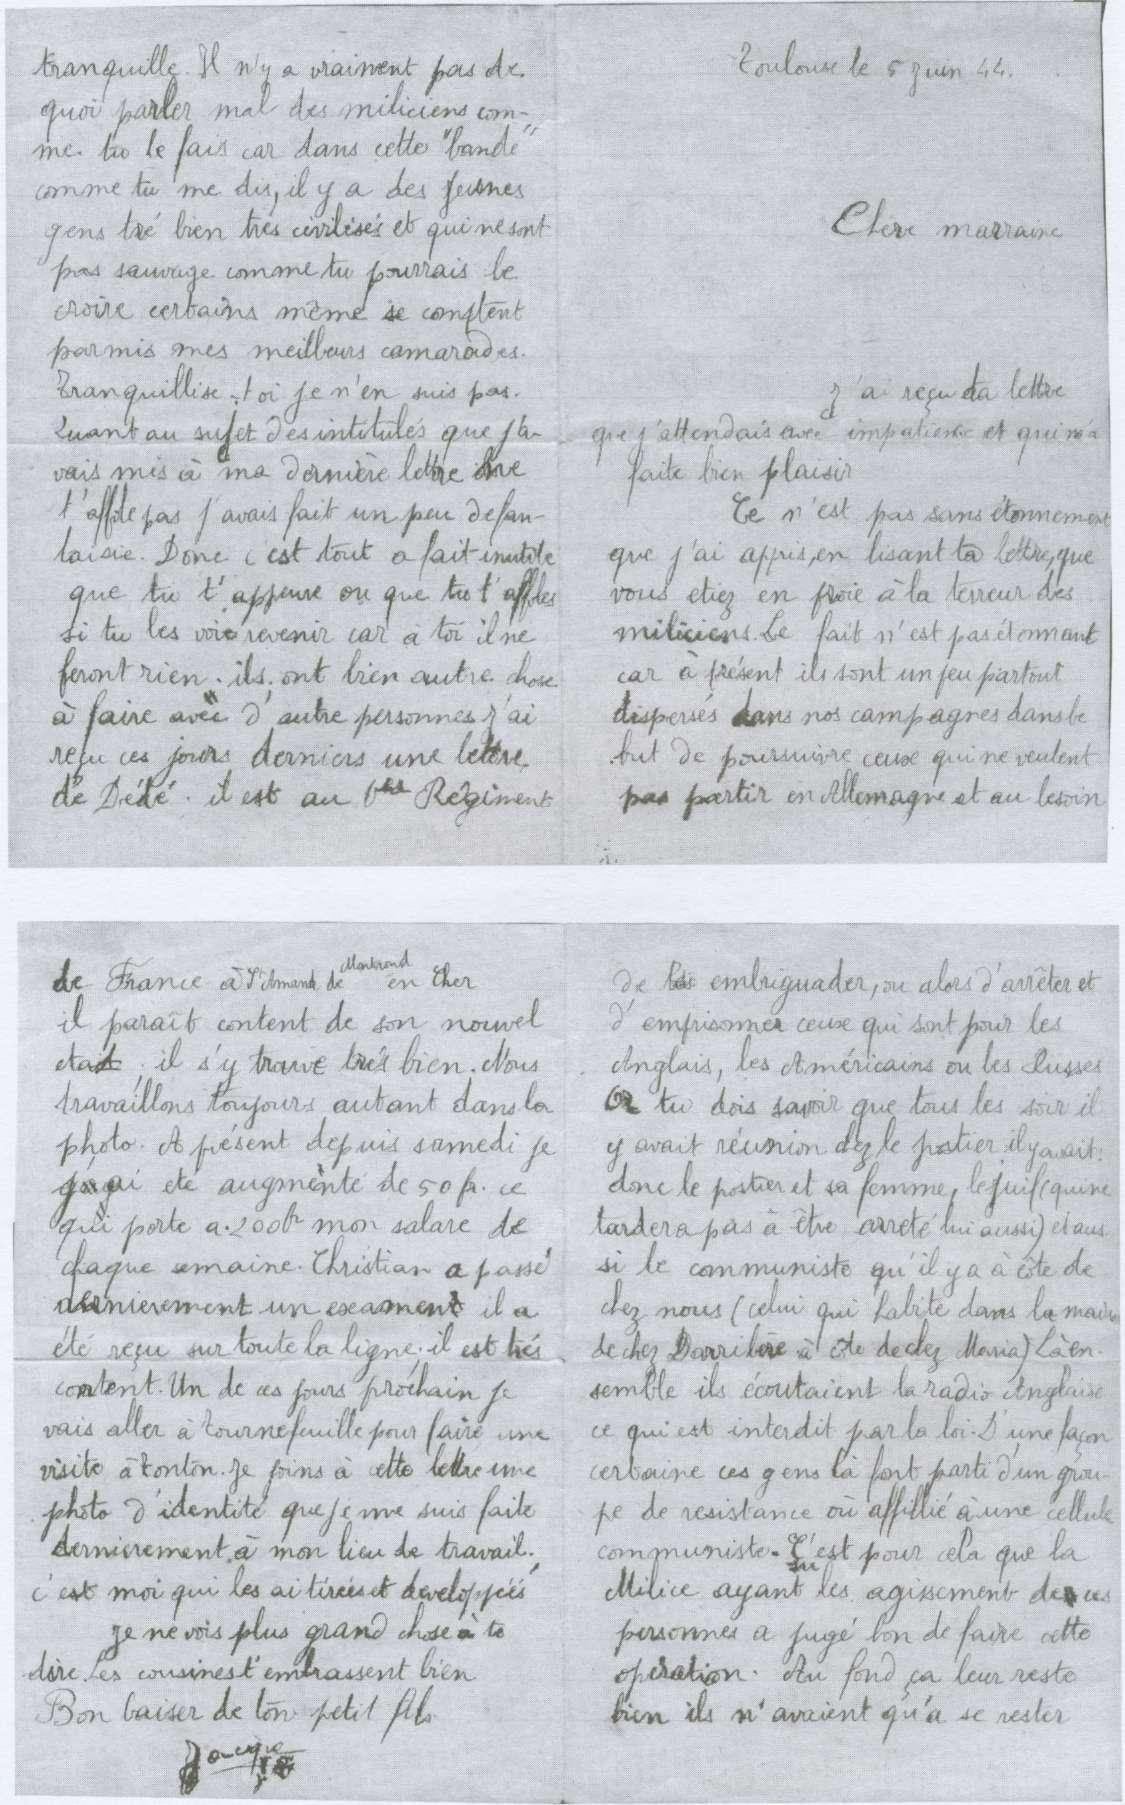 Tome3-Memoire-heurs-et-malheursPage114